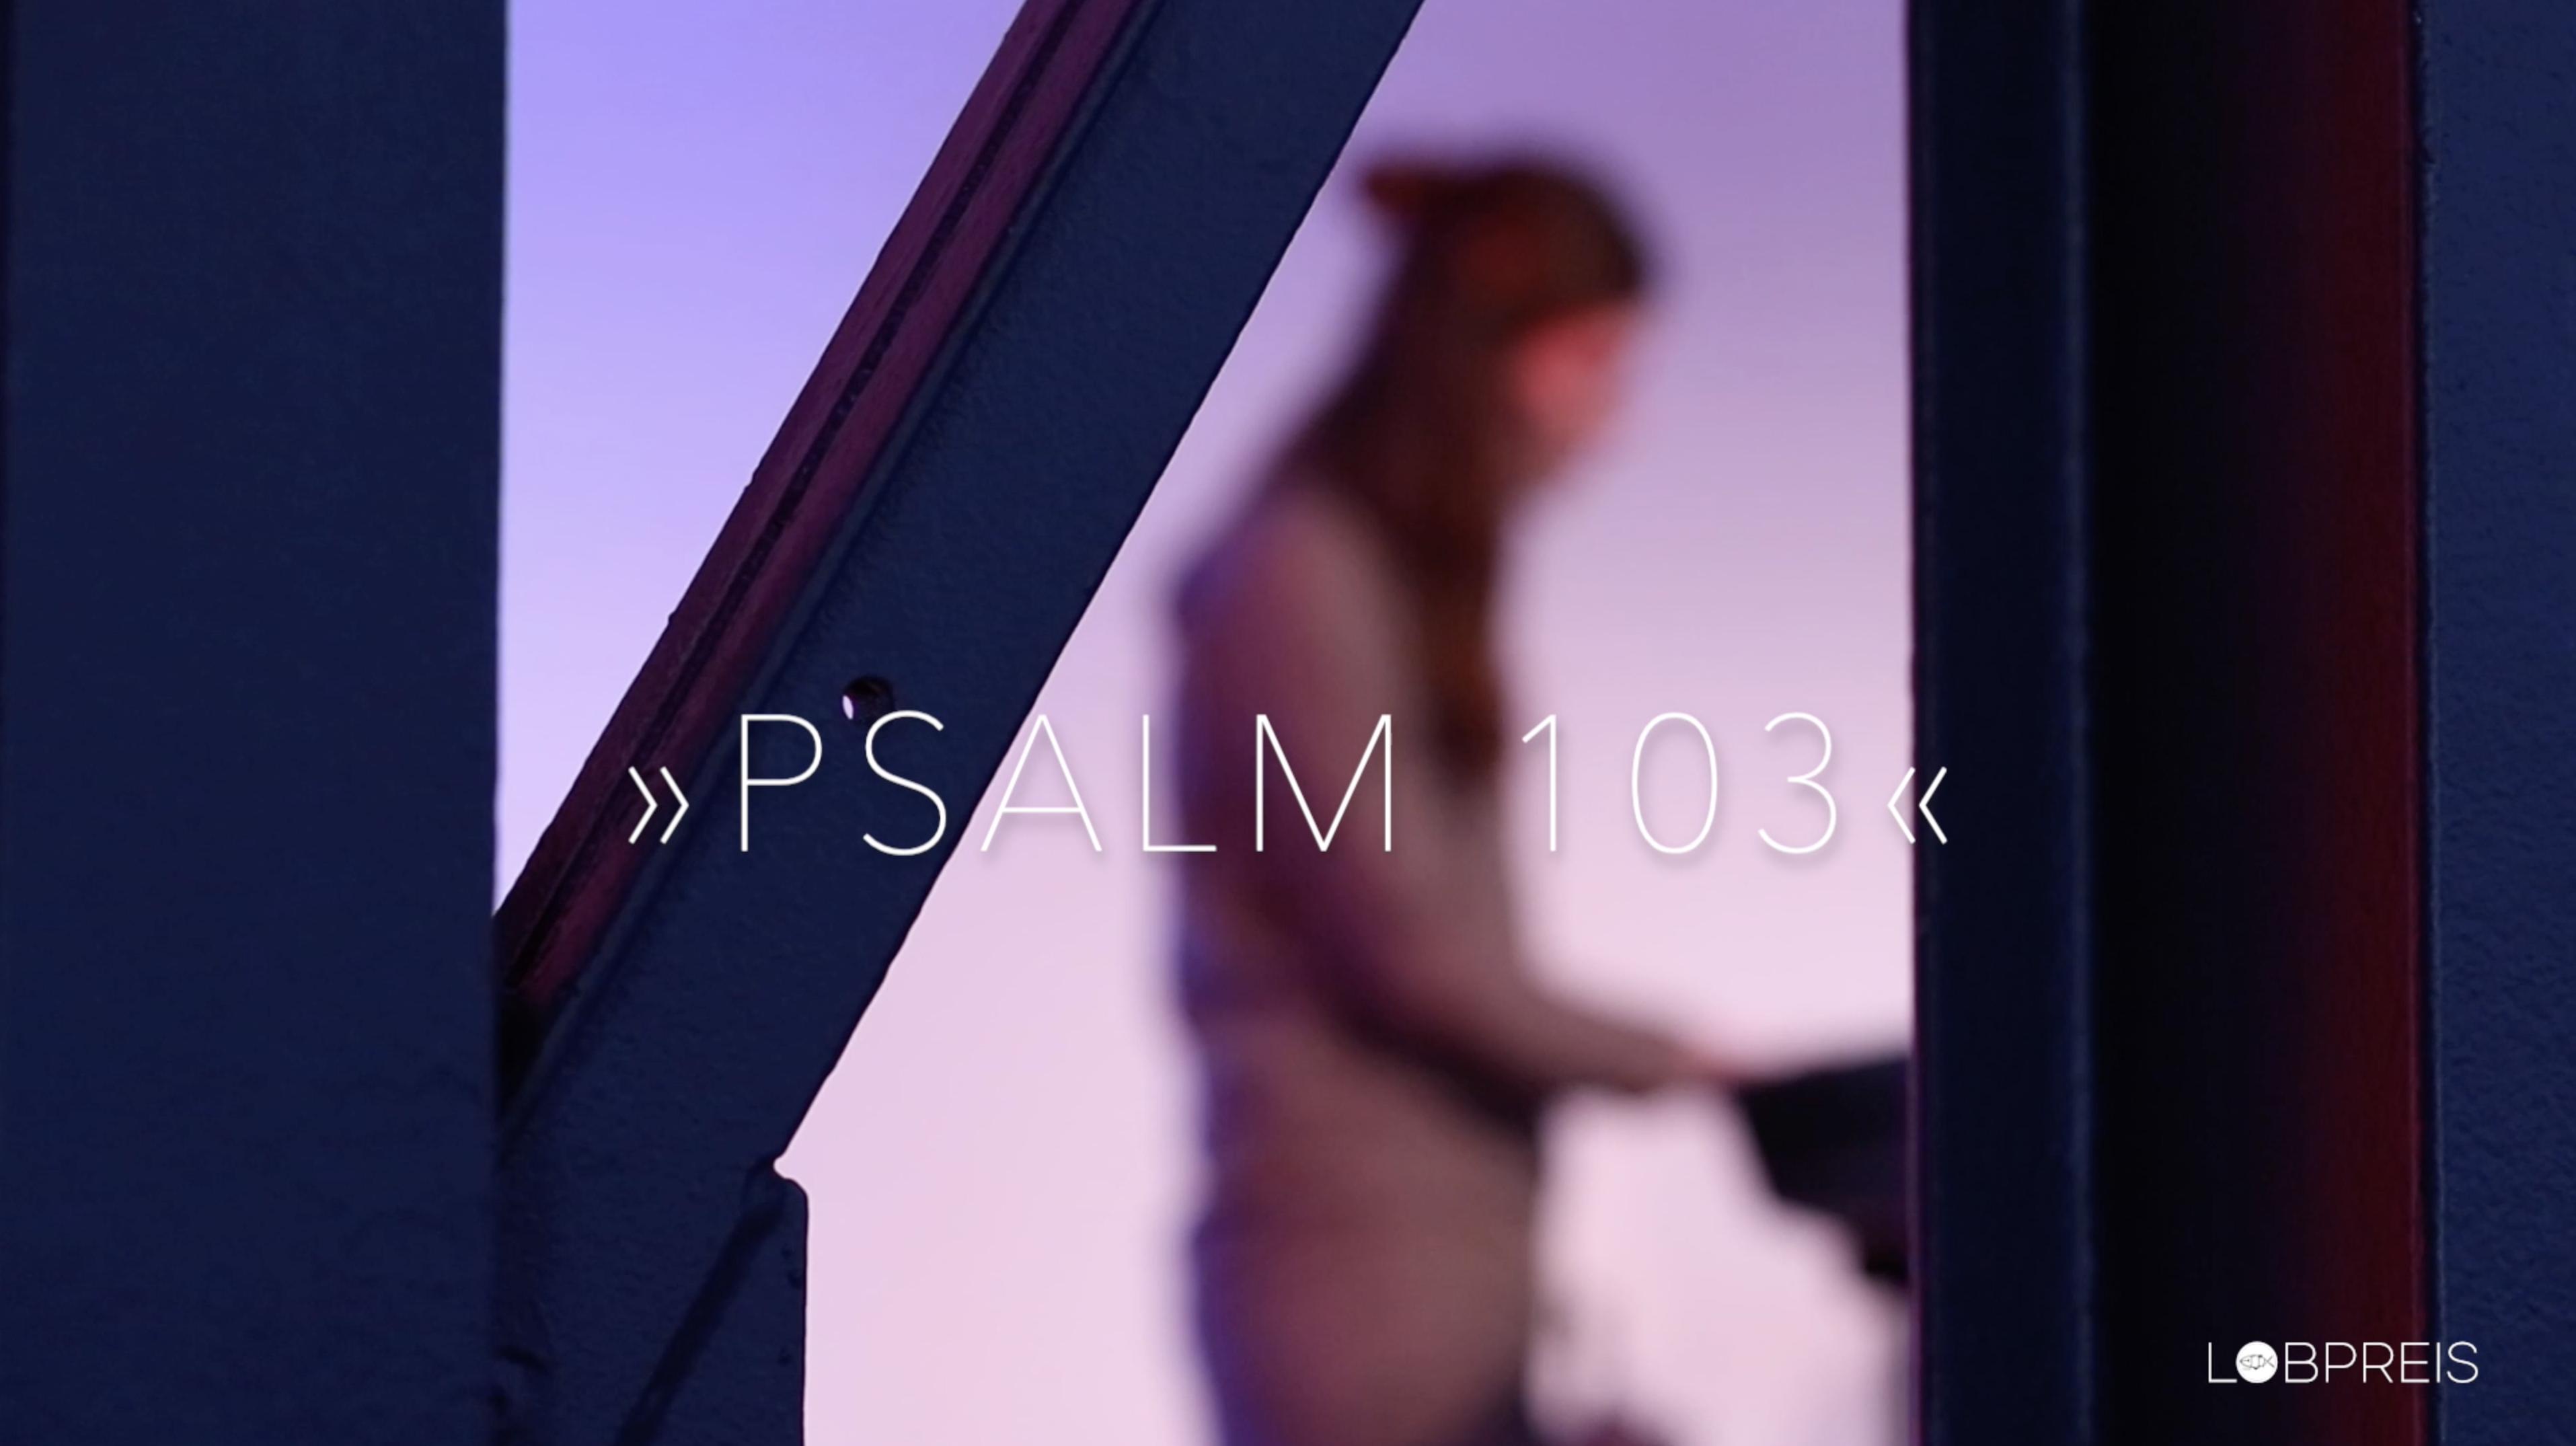 E.L.I.A.-Lobpreis – »Psalm 103« – Musikvideo